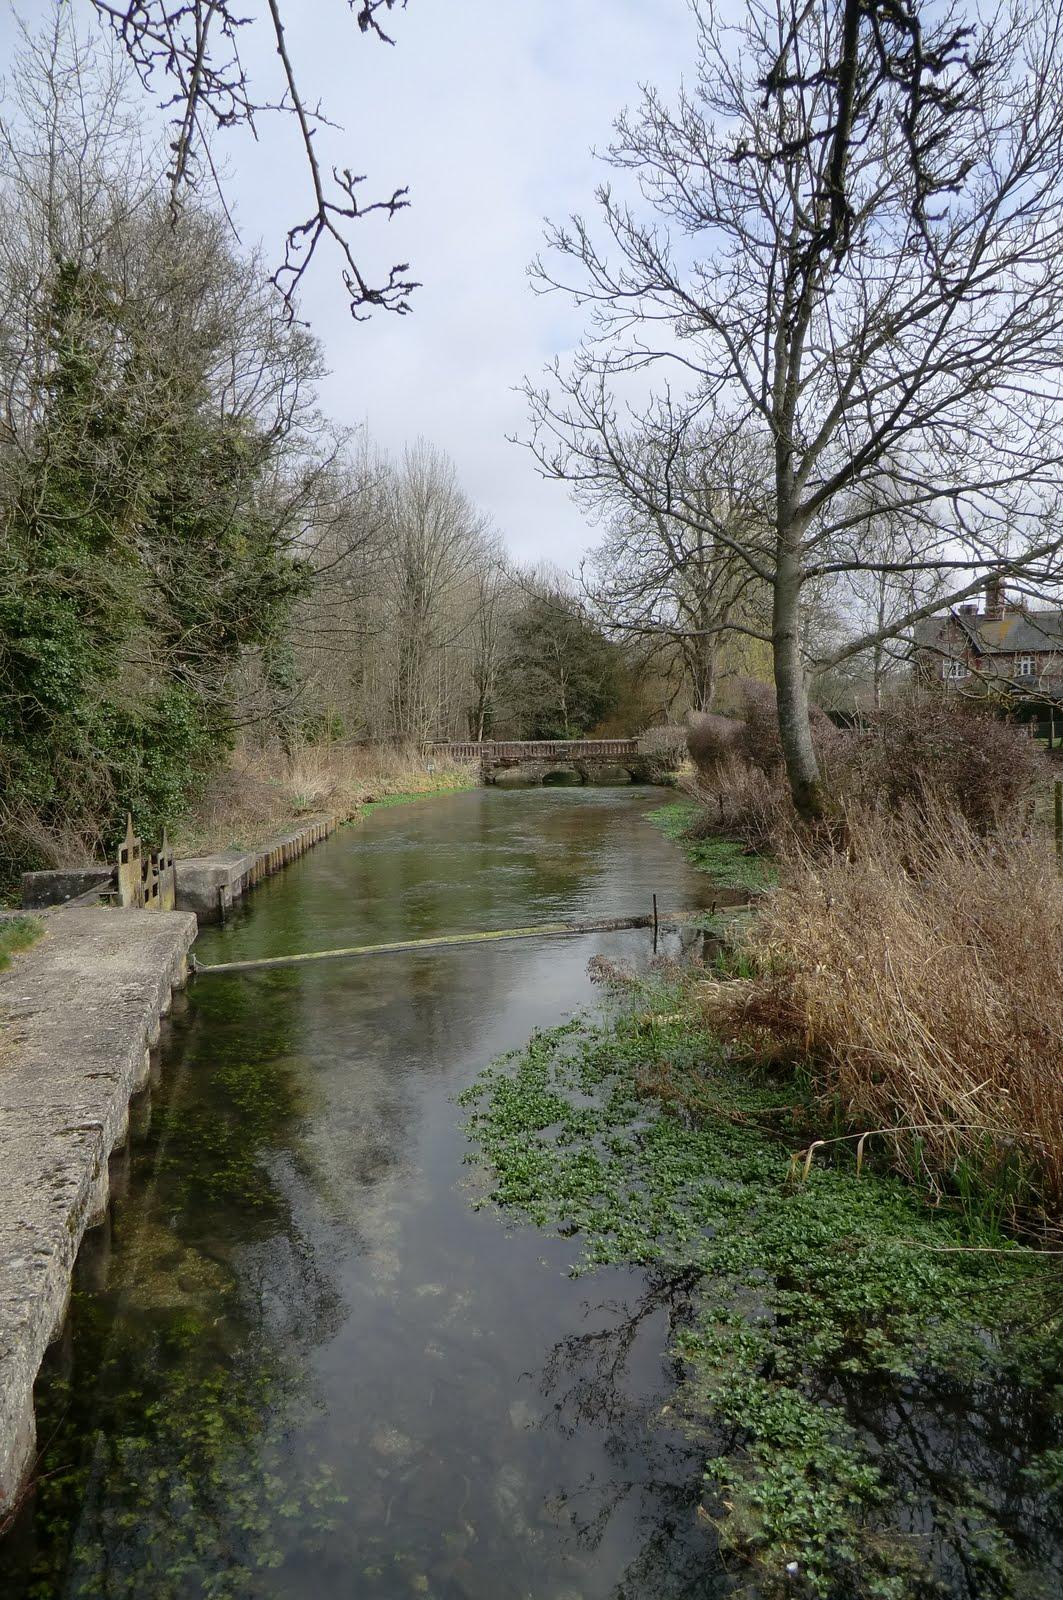 CIMG1703 River Test at Freefolk